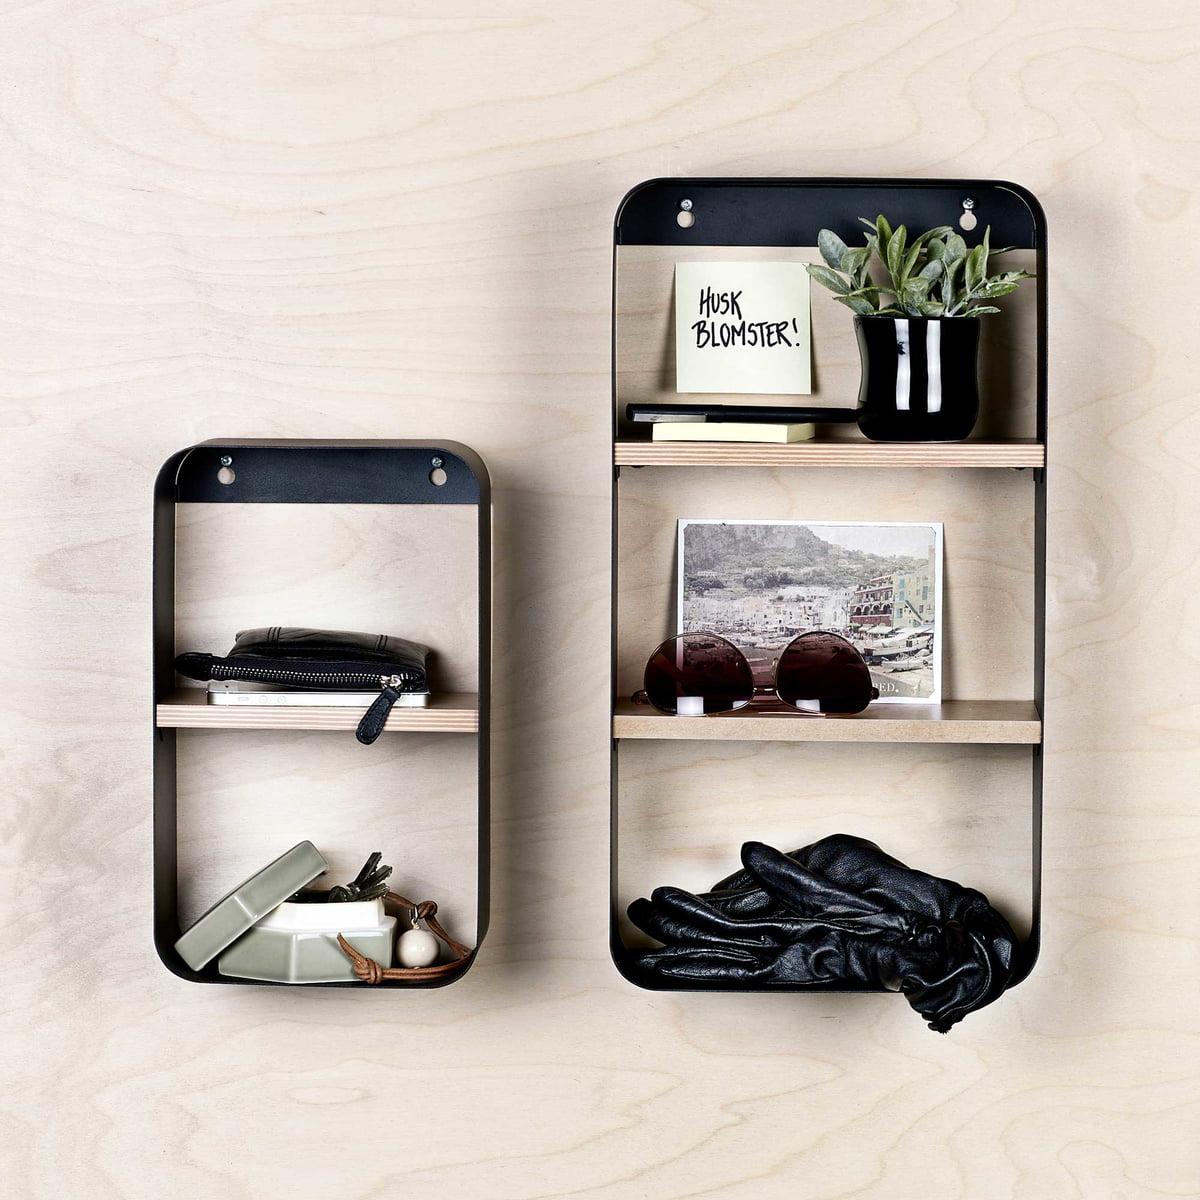 room wandregal von s dahl im shop kaufen. Black Bedroom Furniture Sets. Home Design Ideas